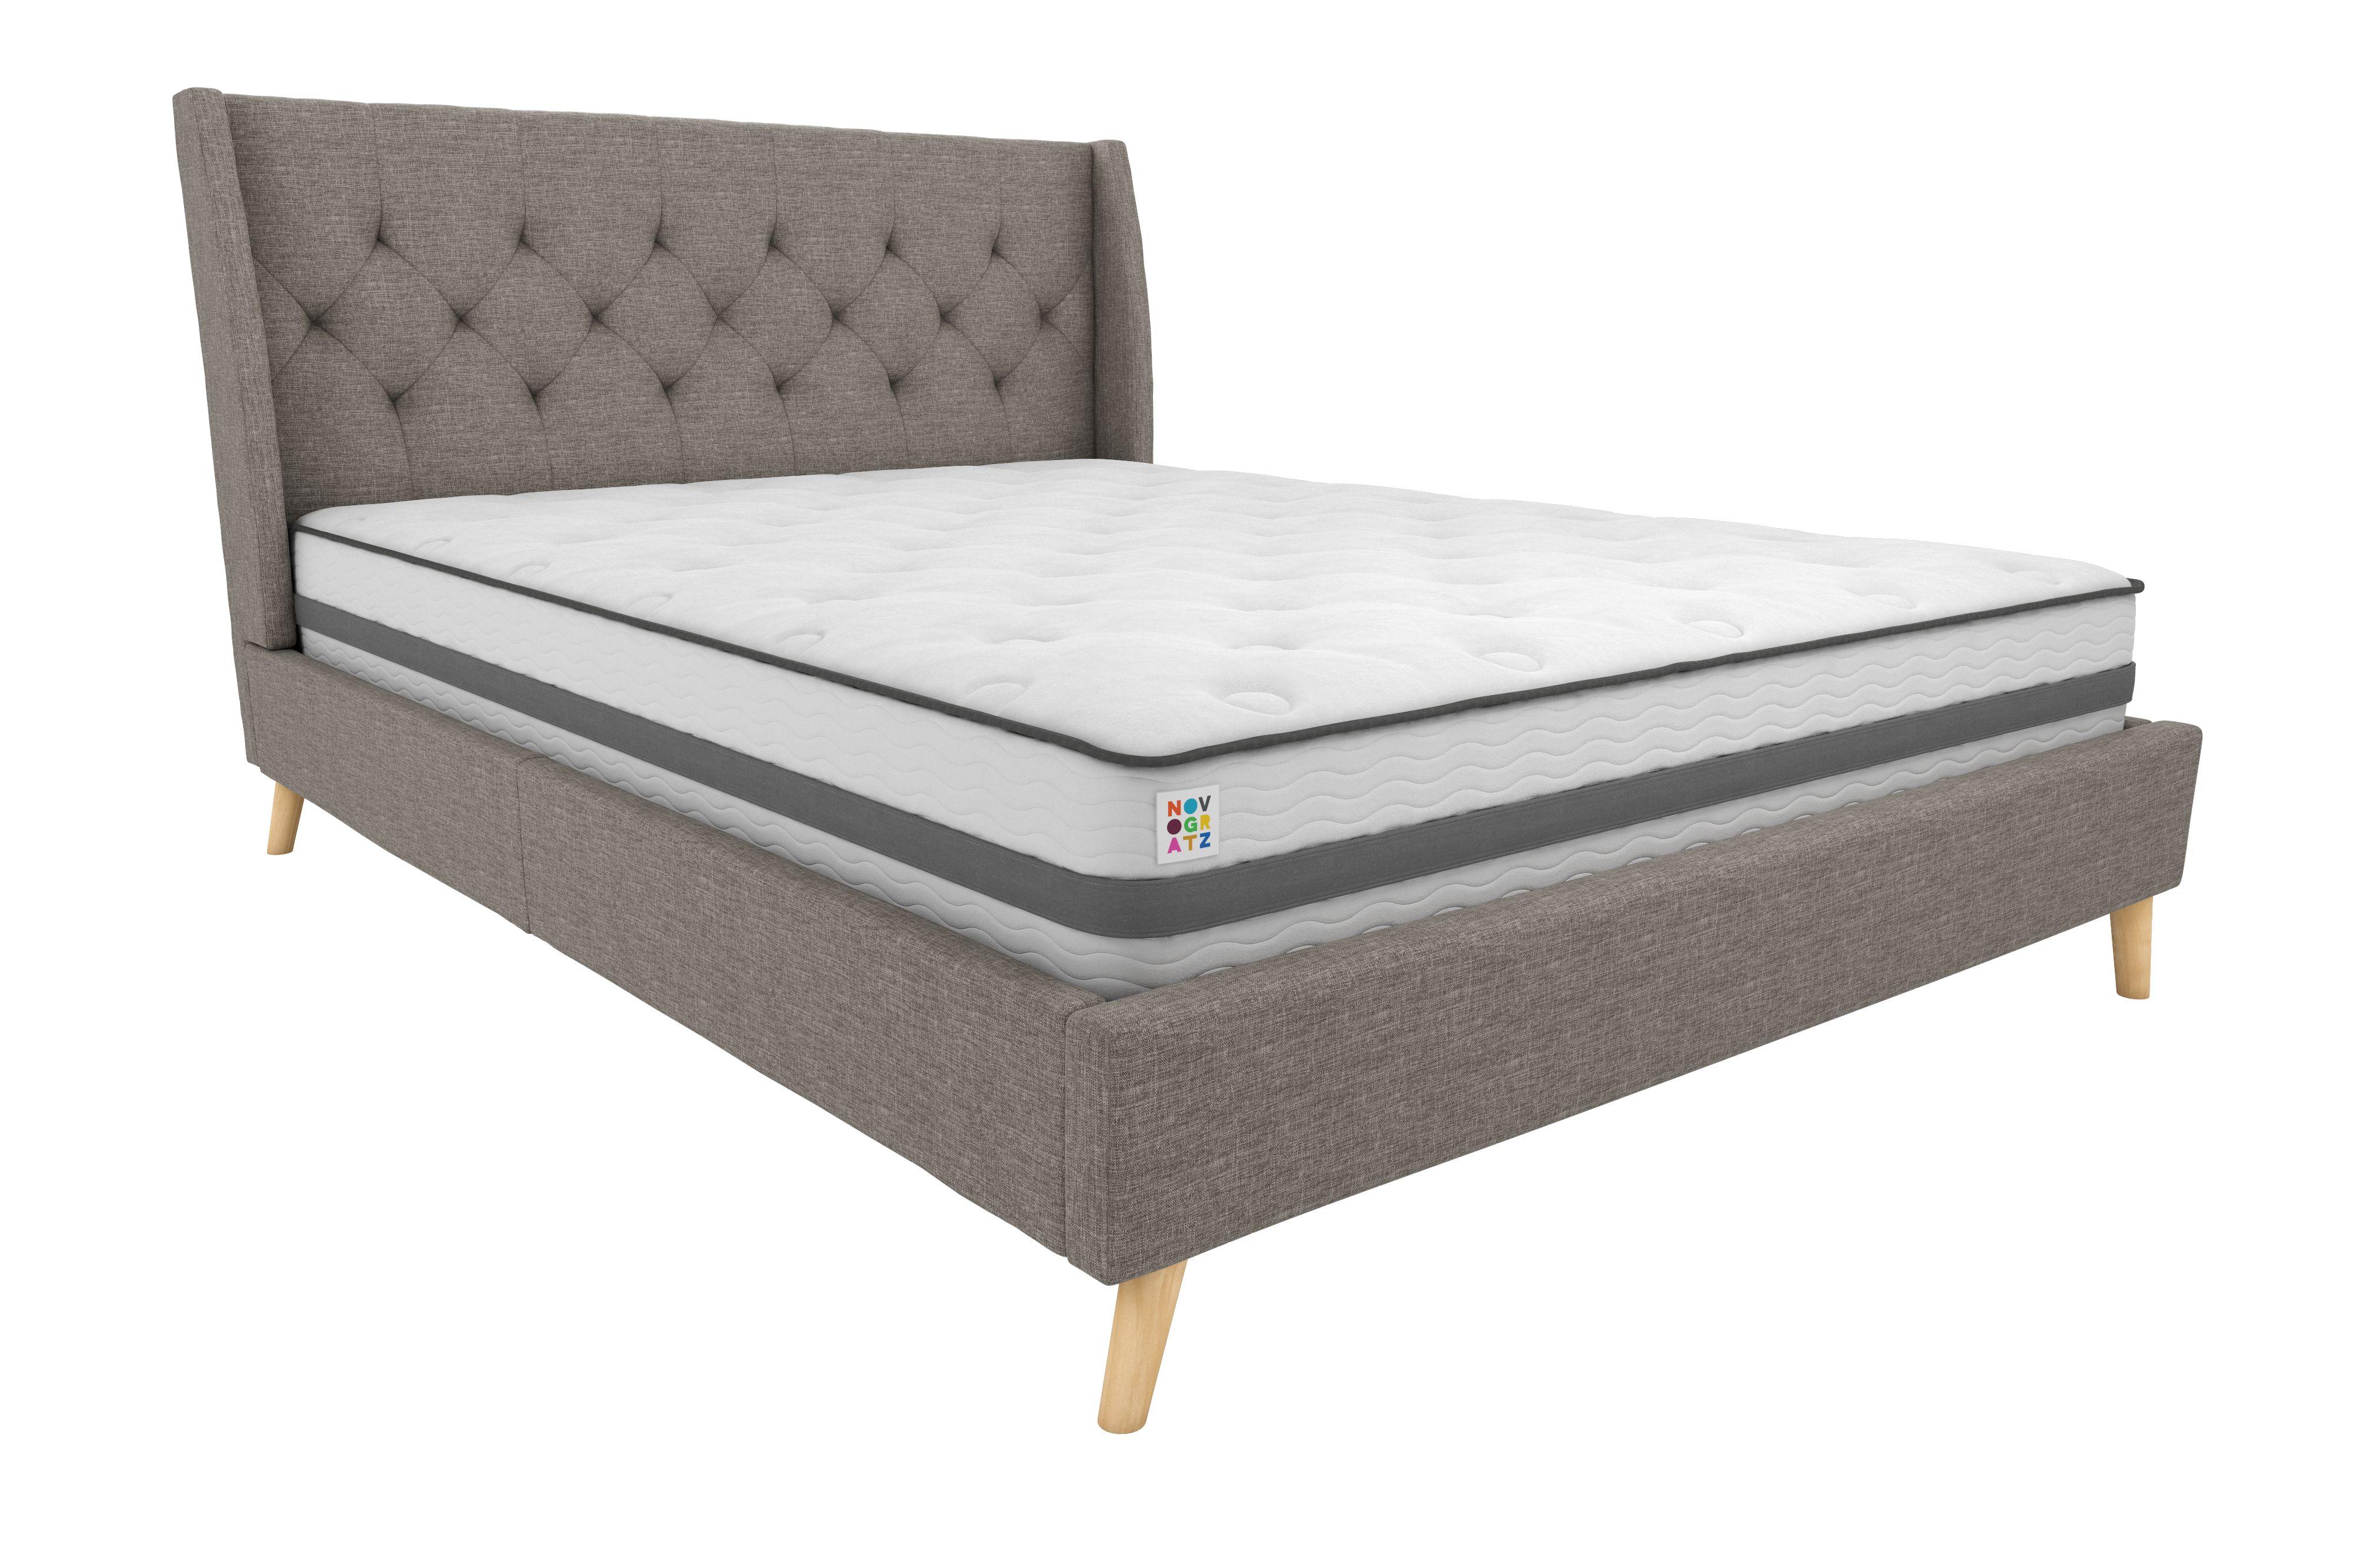 photo bedroom amazon best just futon dreams for mattress